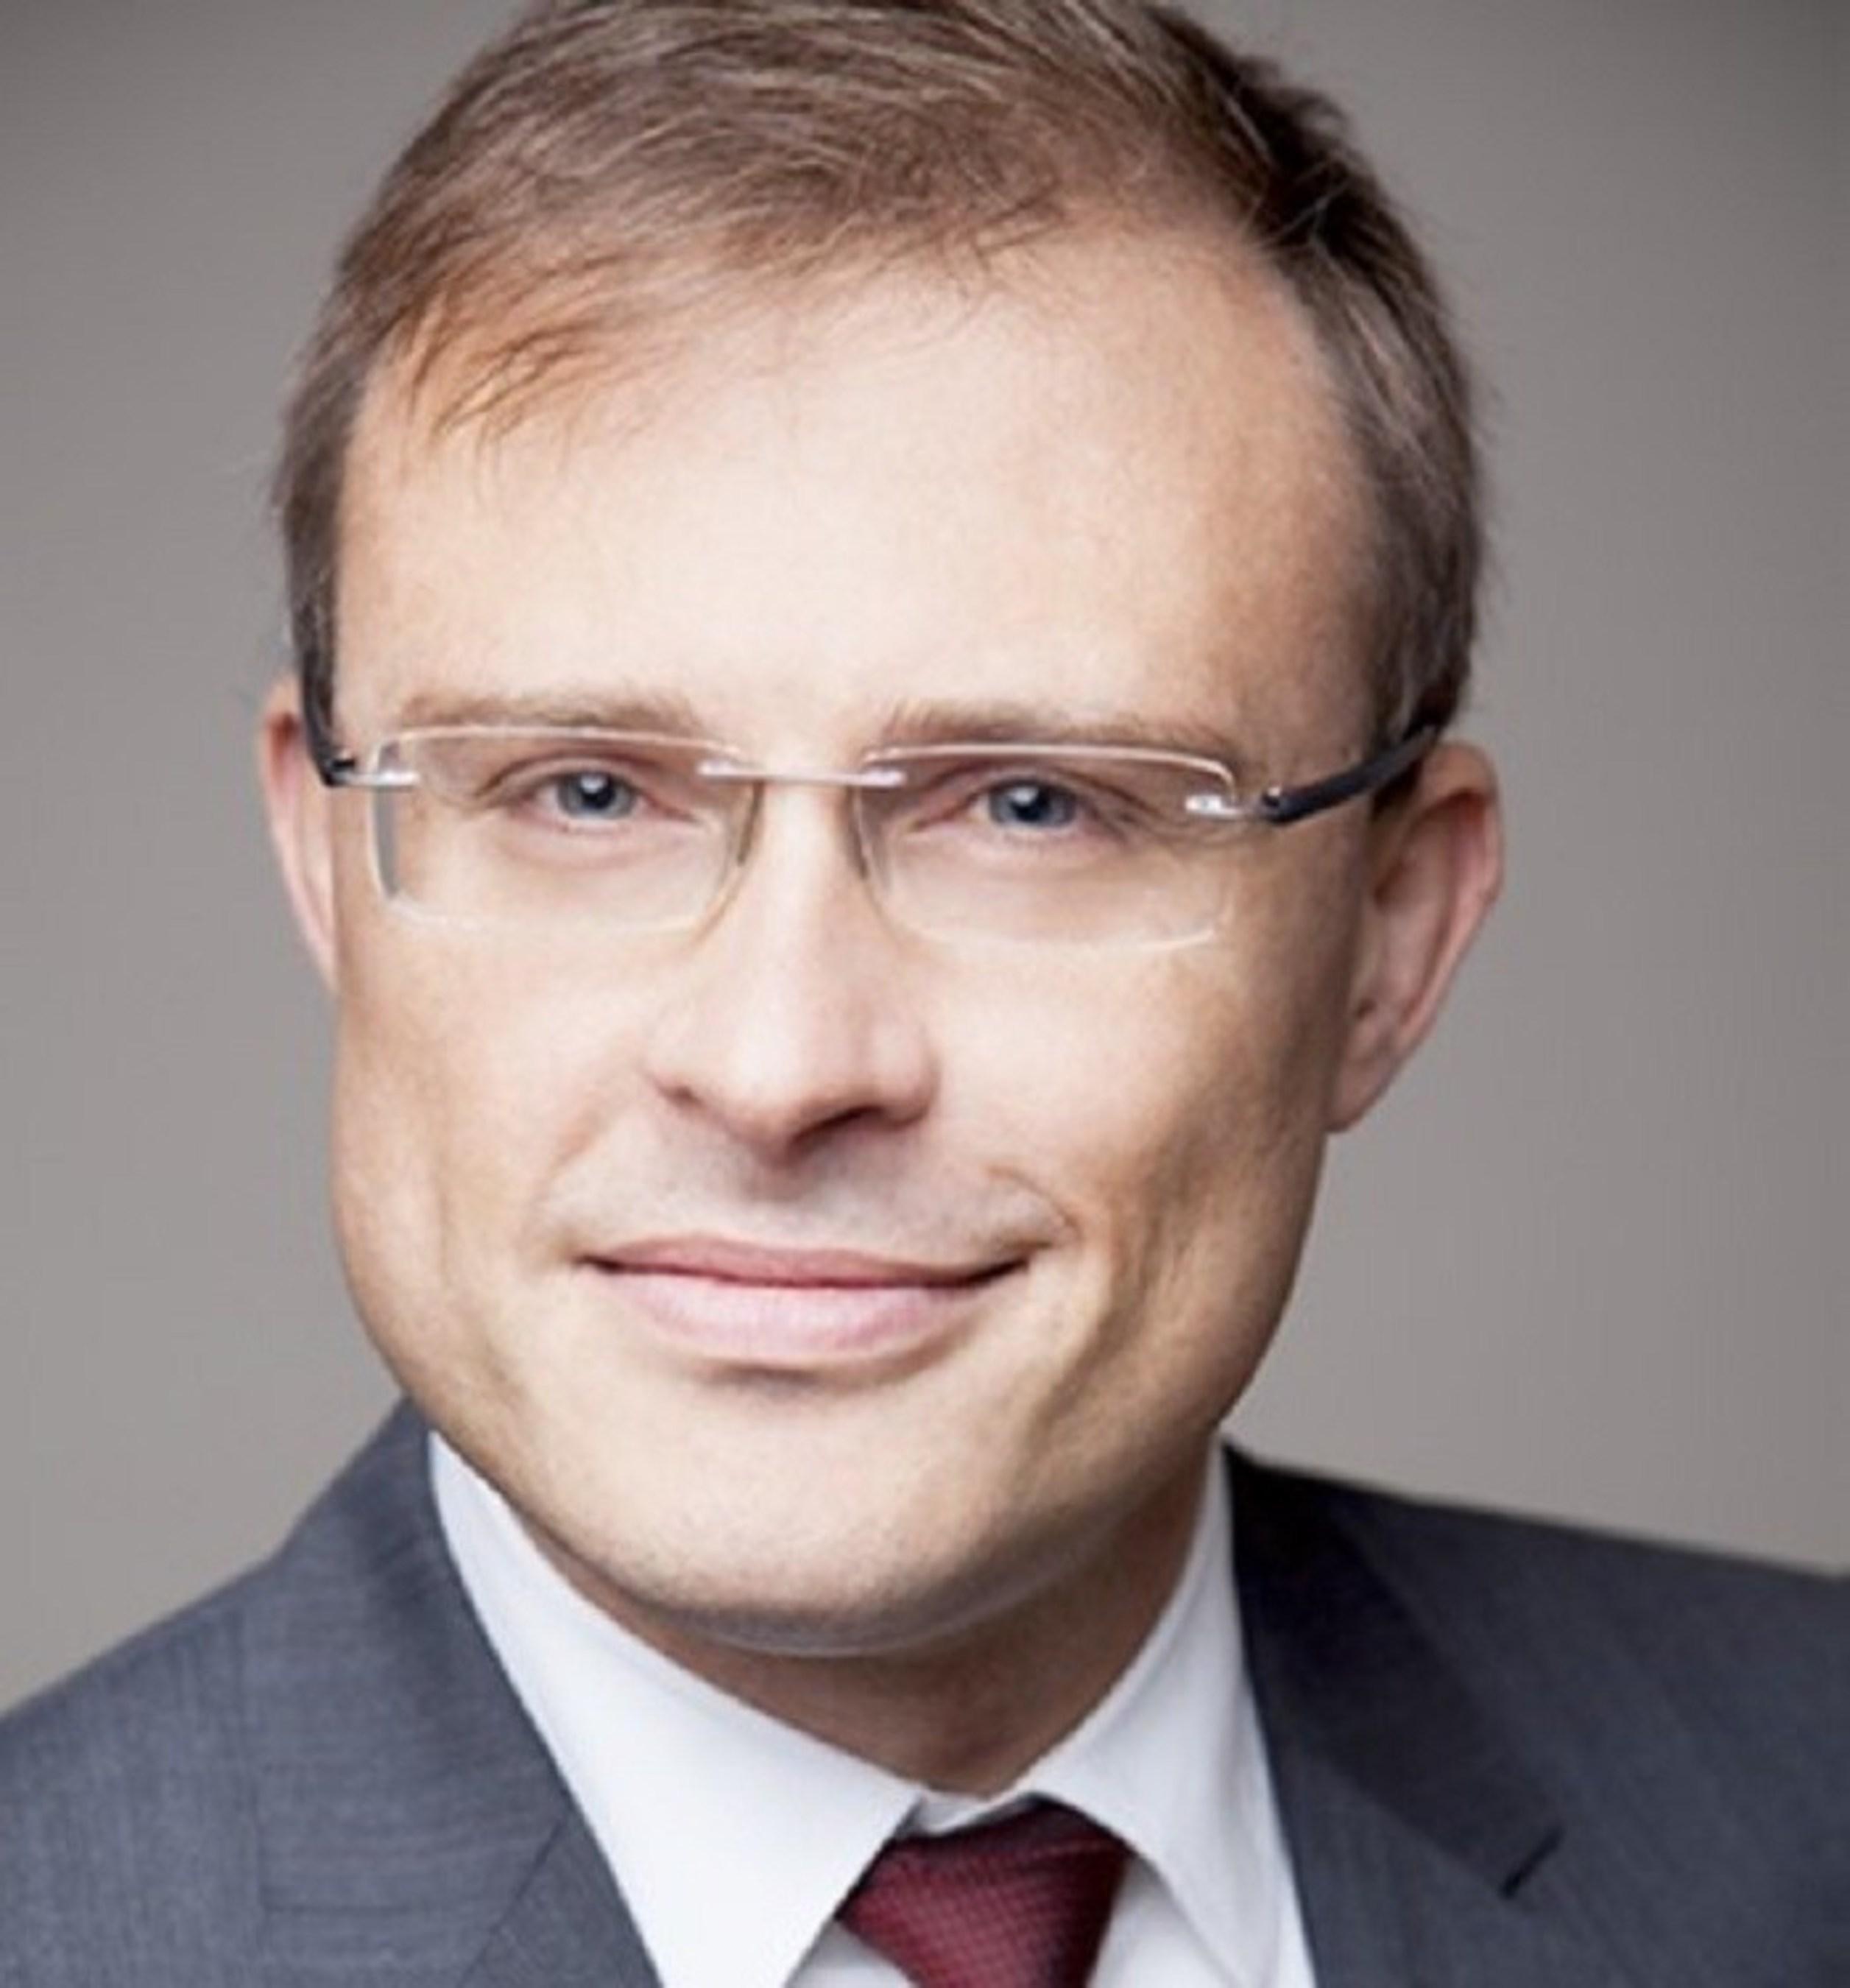 Olivier Lehmann, Principal, Blue Ridge Partners